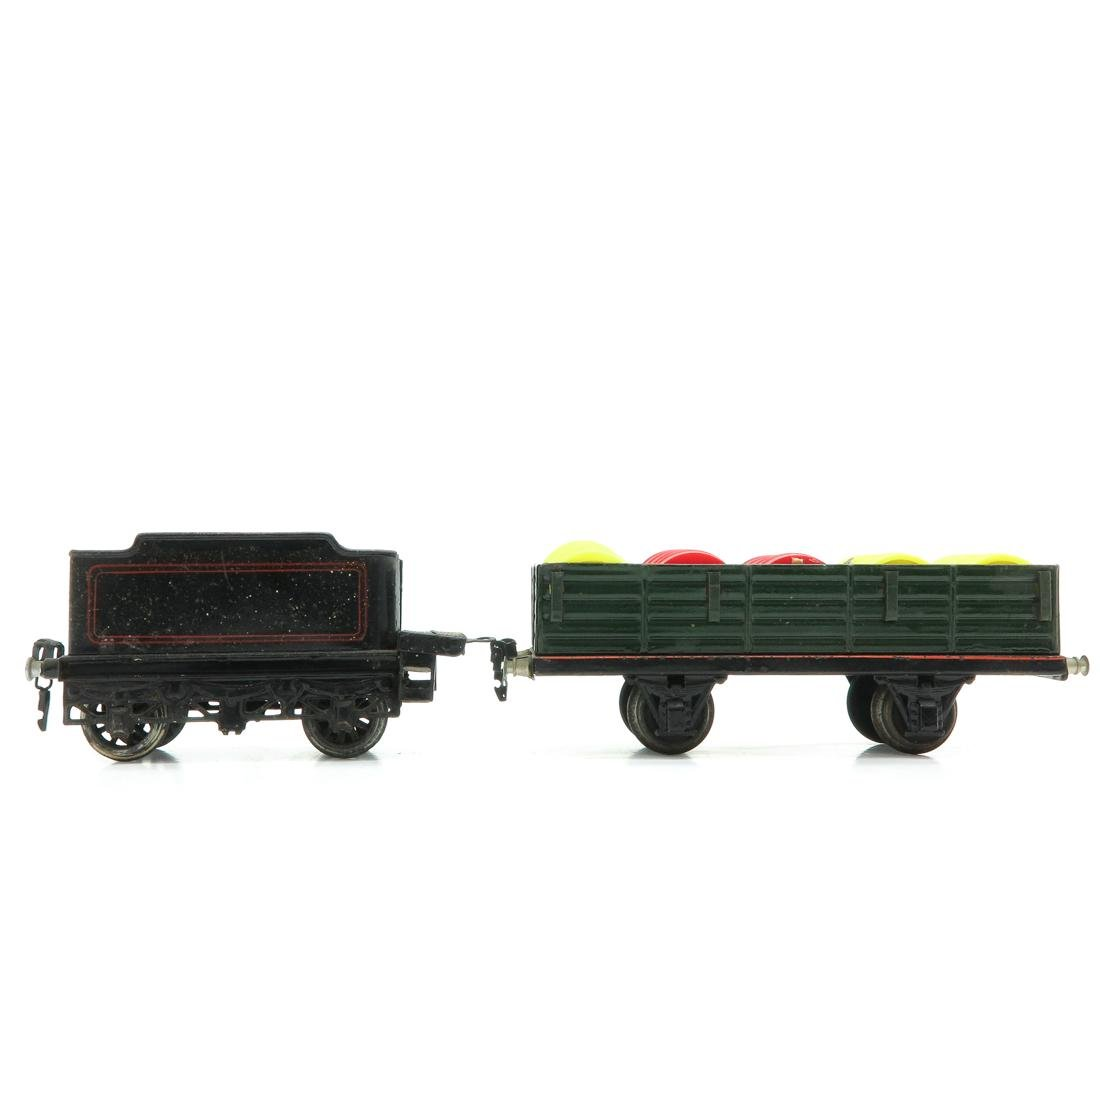 Lot of 2 Vintage Marklin Wagons - 3